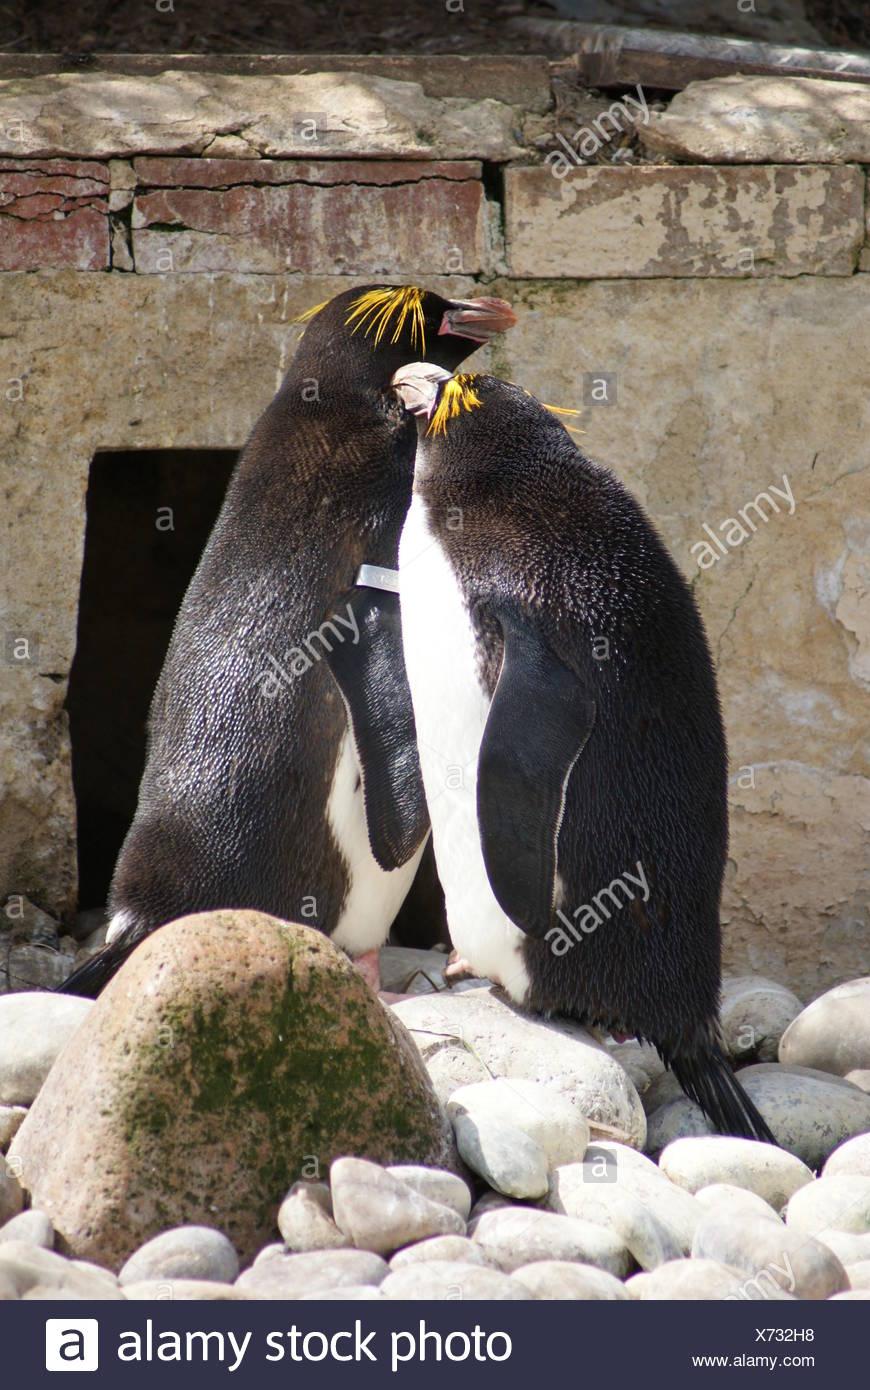 Blue Animal Bird Penguin Wildlife Emperor King